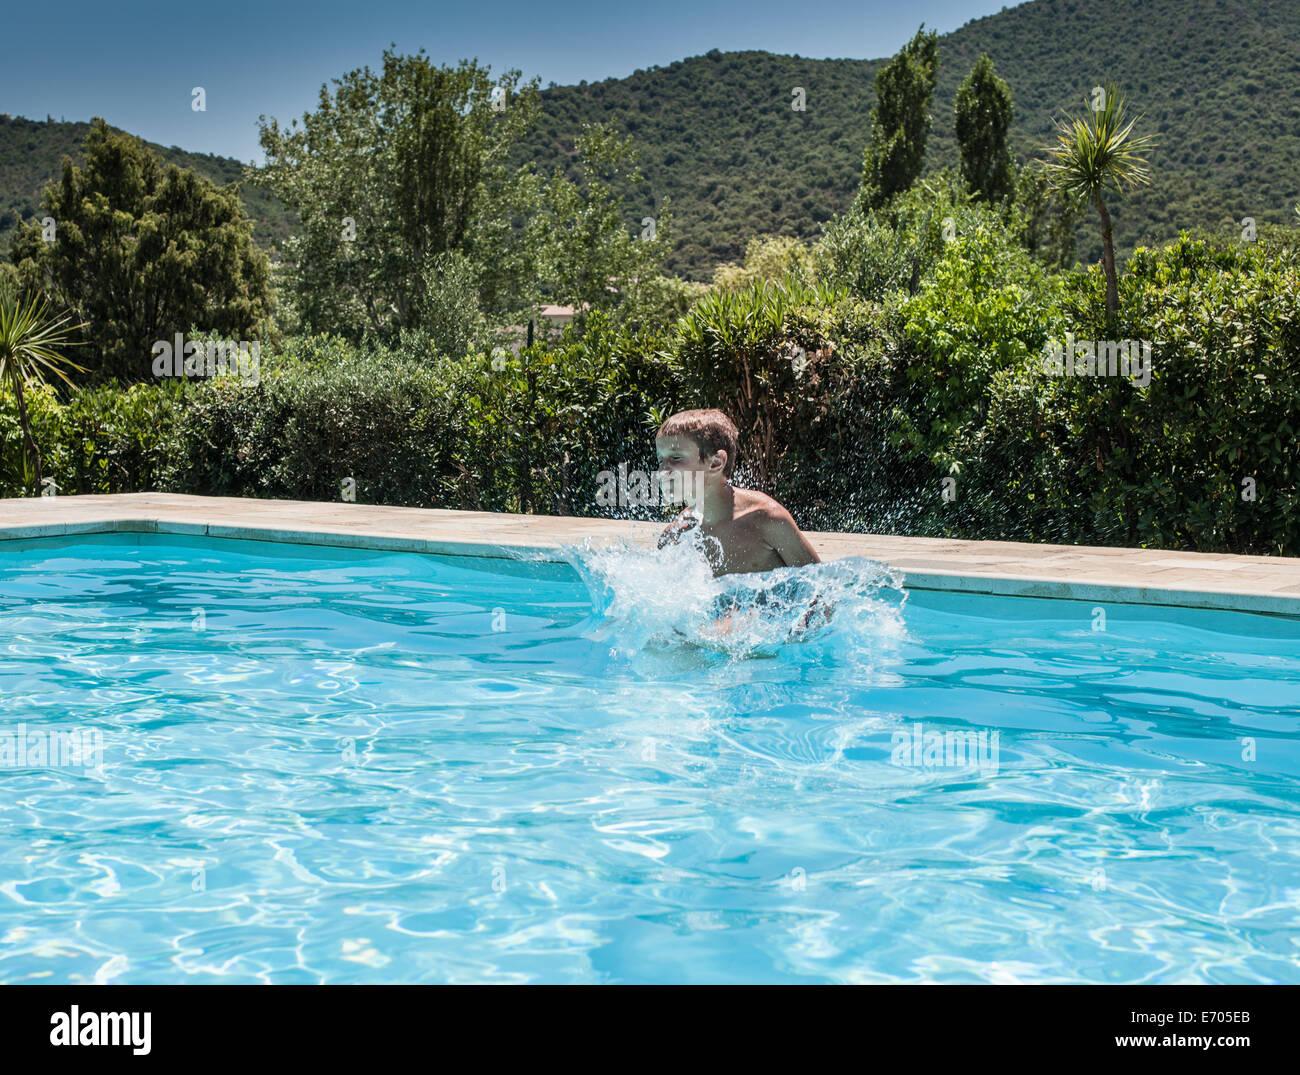 Boy splashing and playing in swimming pool, Capoterra, Sardinia, Italy Stock Photo